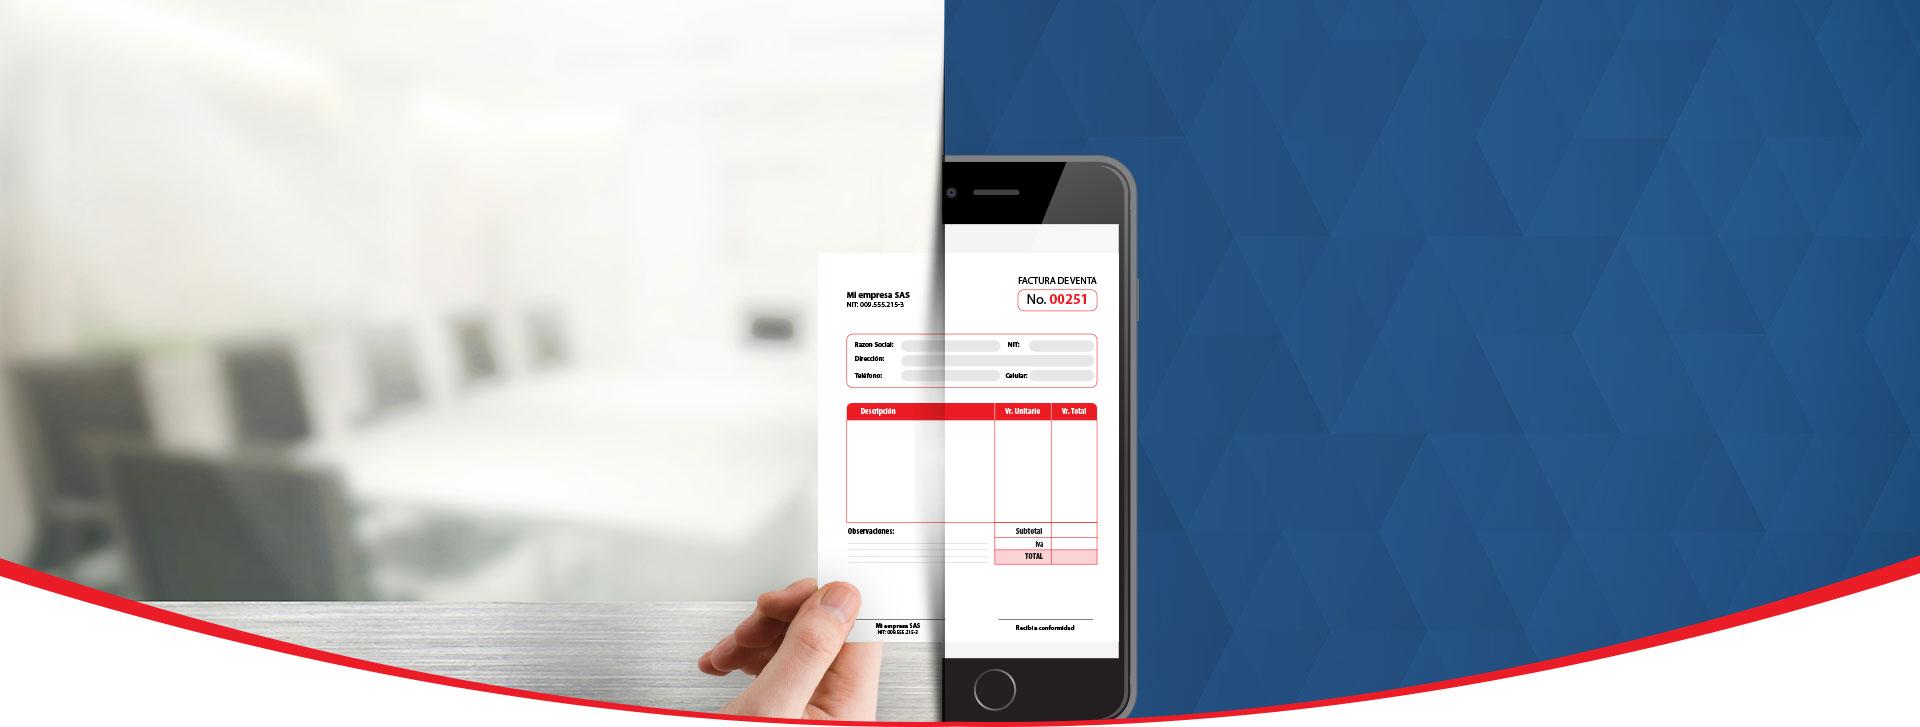 Facturación digital proveedor